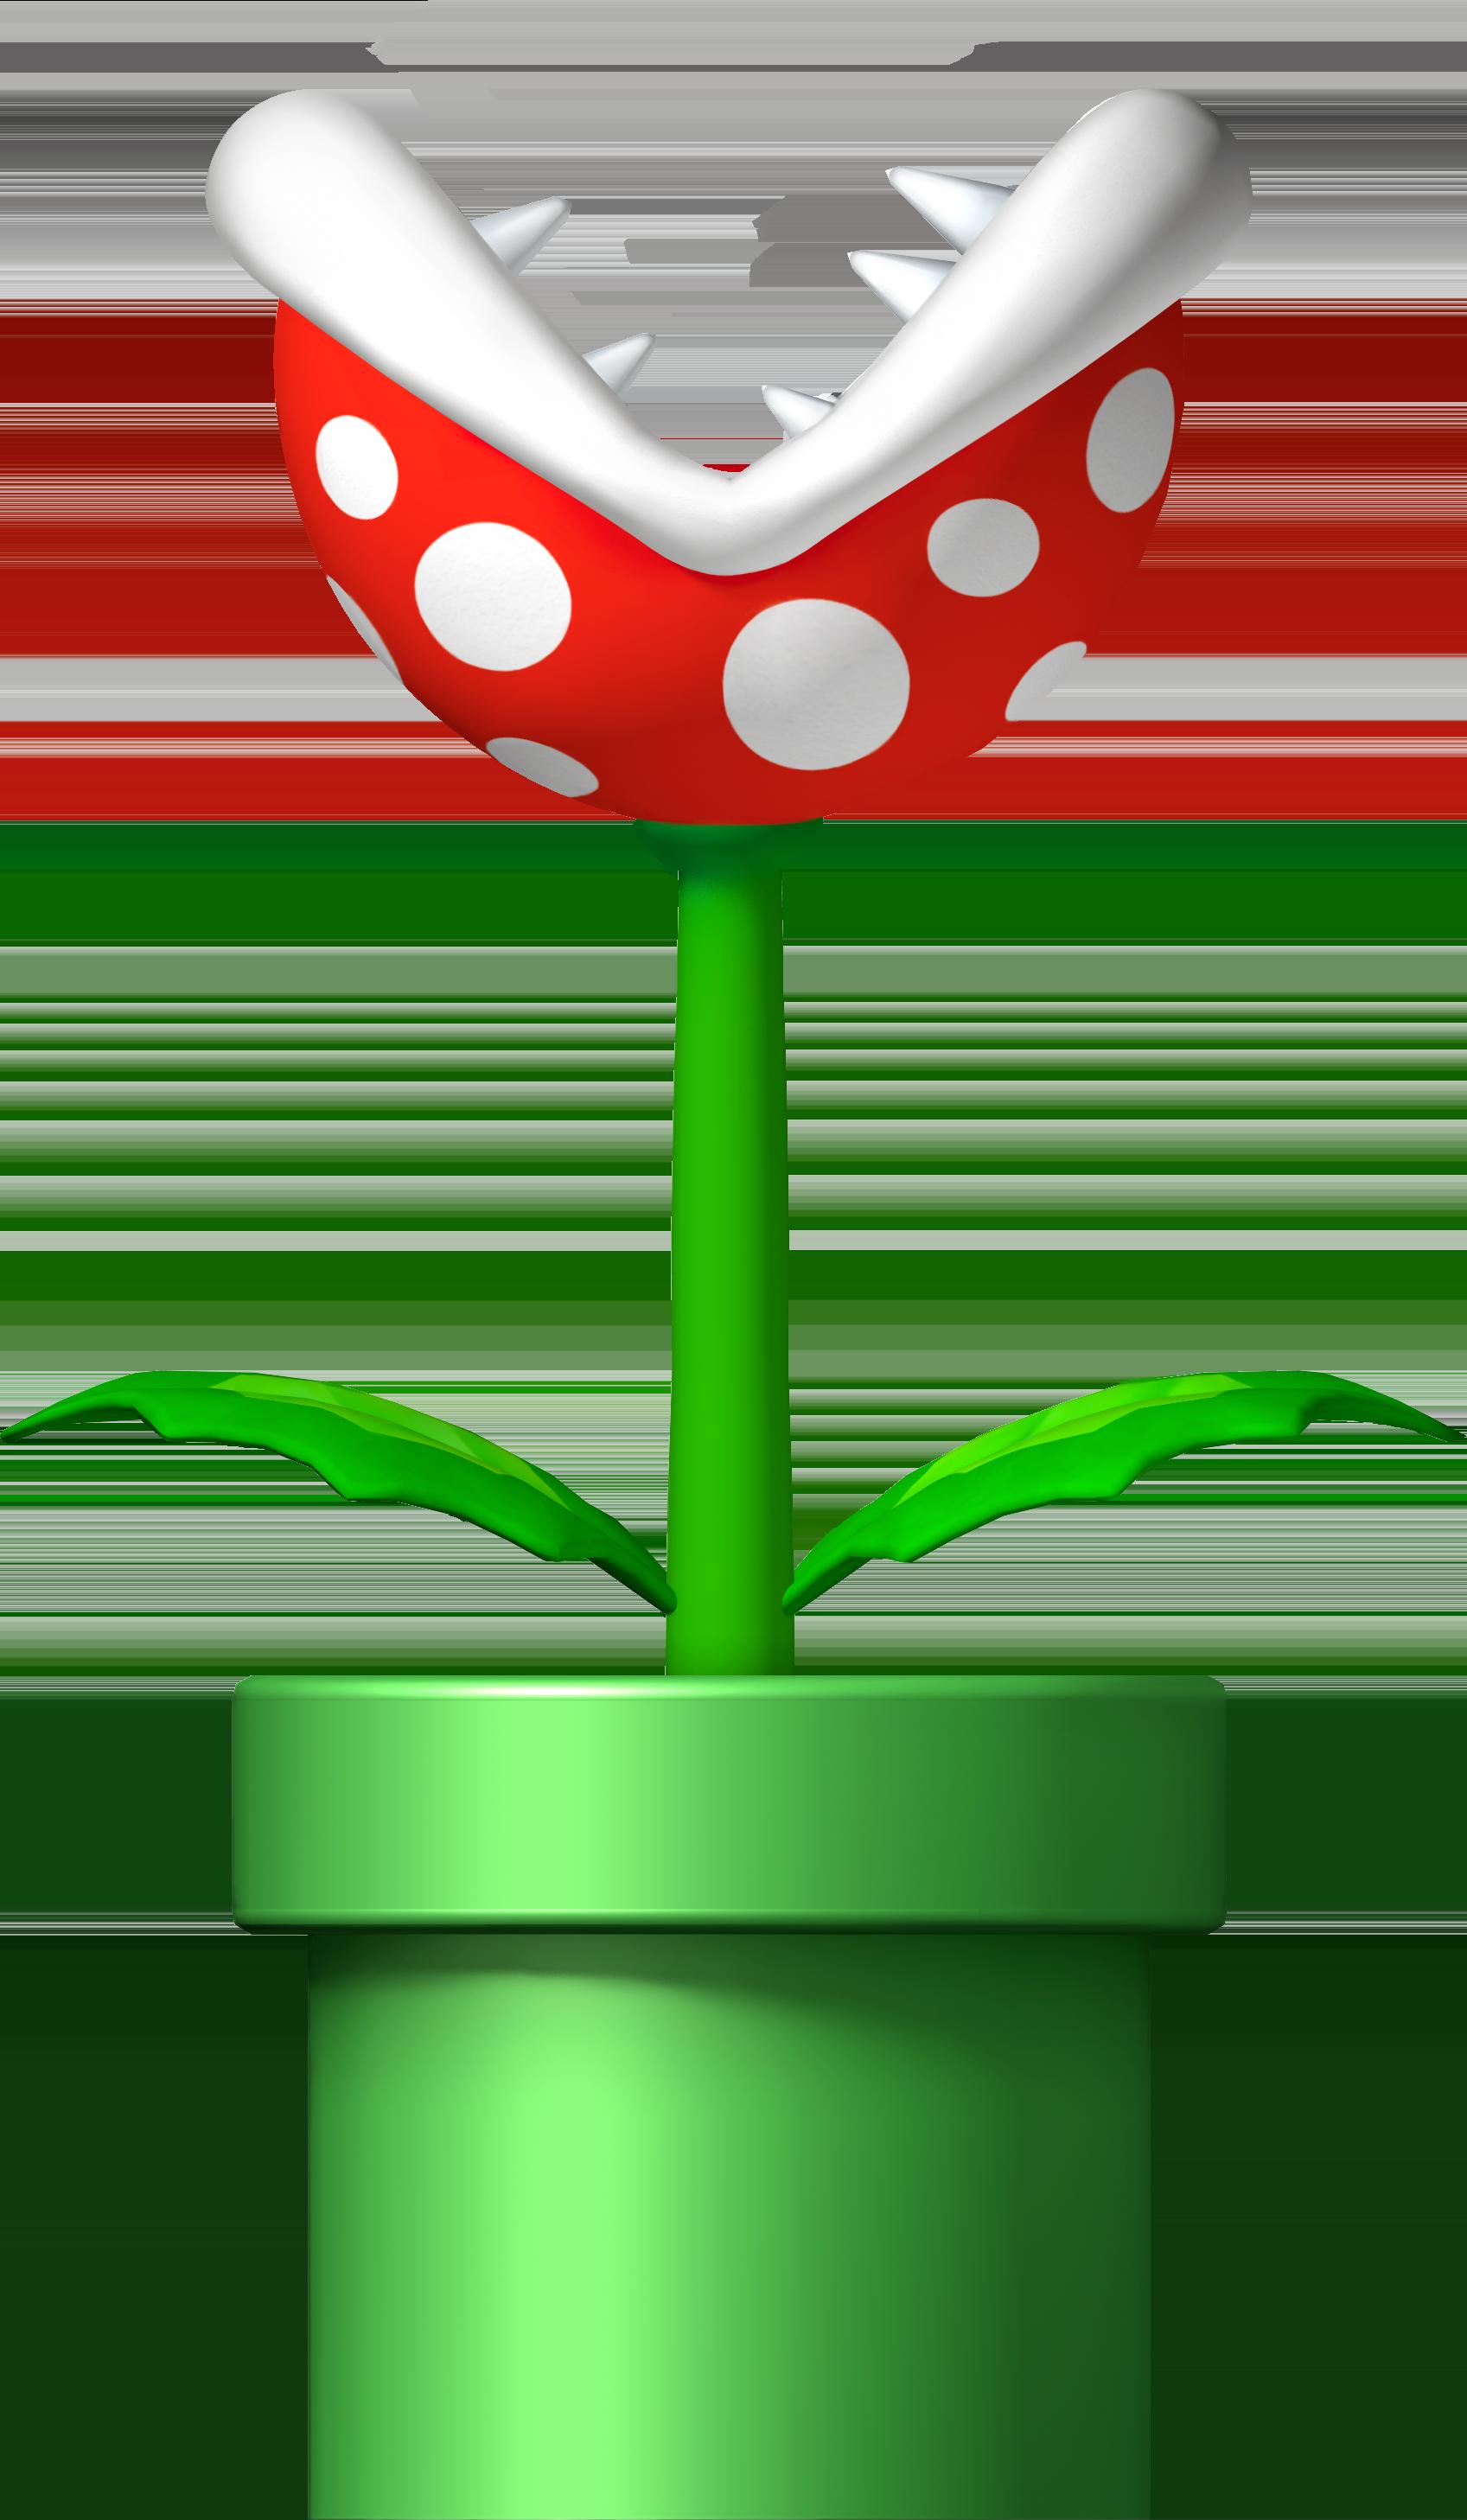 Super mario unneeded flowers clipart banner free Piranha Plant | Kaizo Mario Maker Wikia | FANDOM powered by ... banner free